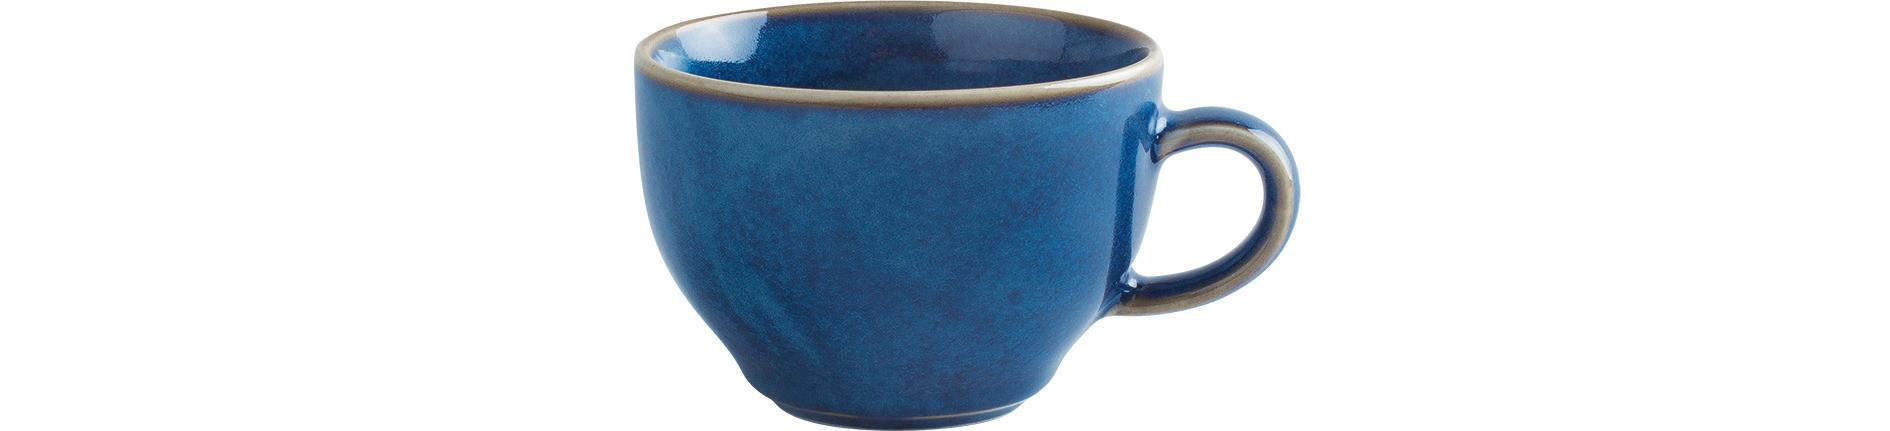 Homestyle, Cappuccinotasse International ø 96 mm / 0,23 l atlantic blue